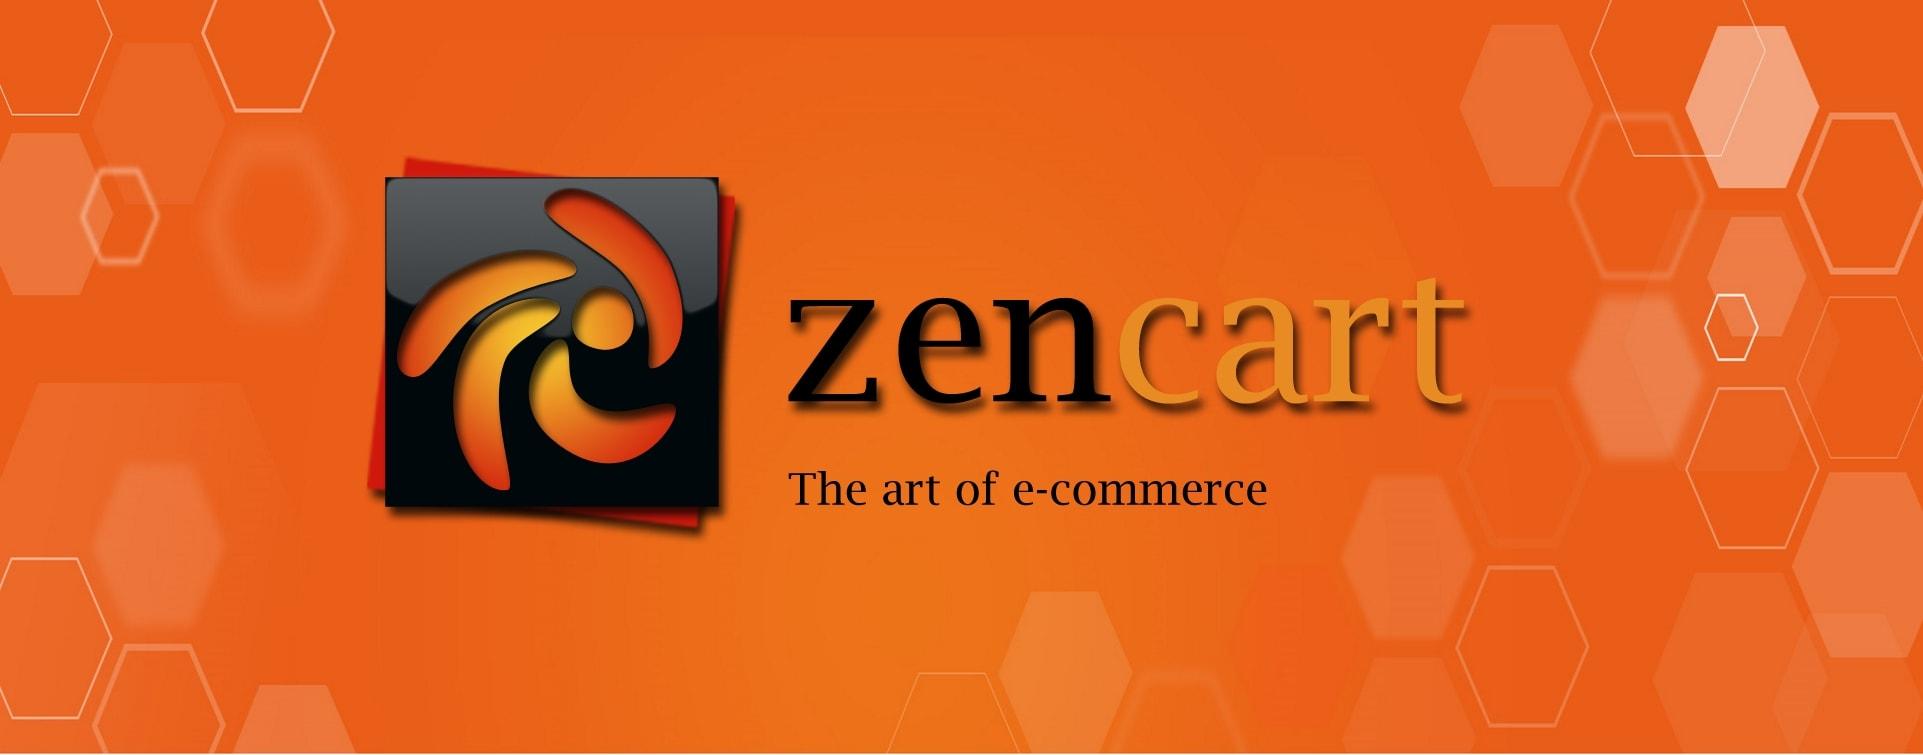 zencart banner_lion vision